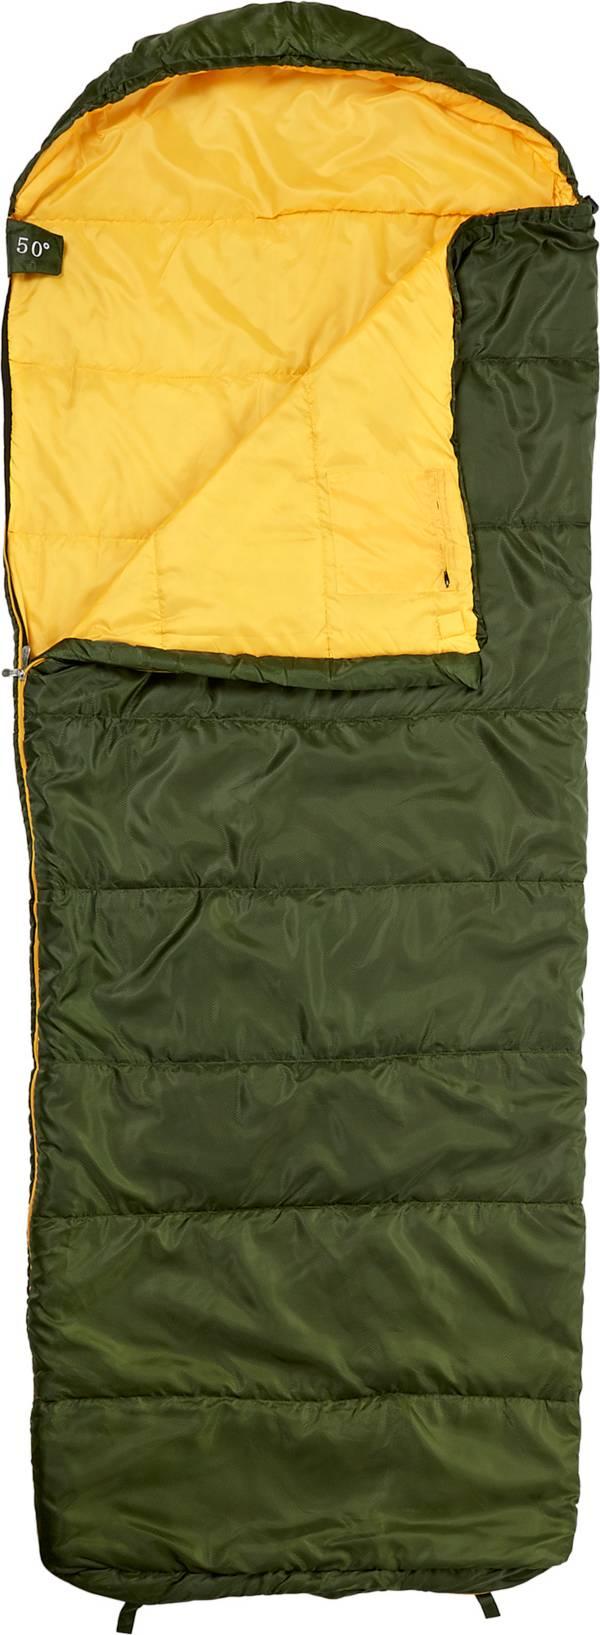 Field & Stream Whisperlite 50°F Sleeping Bag product image